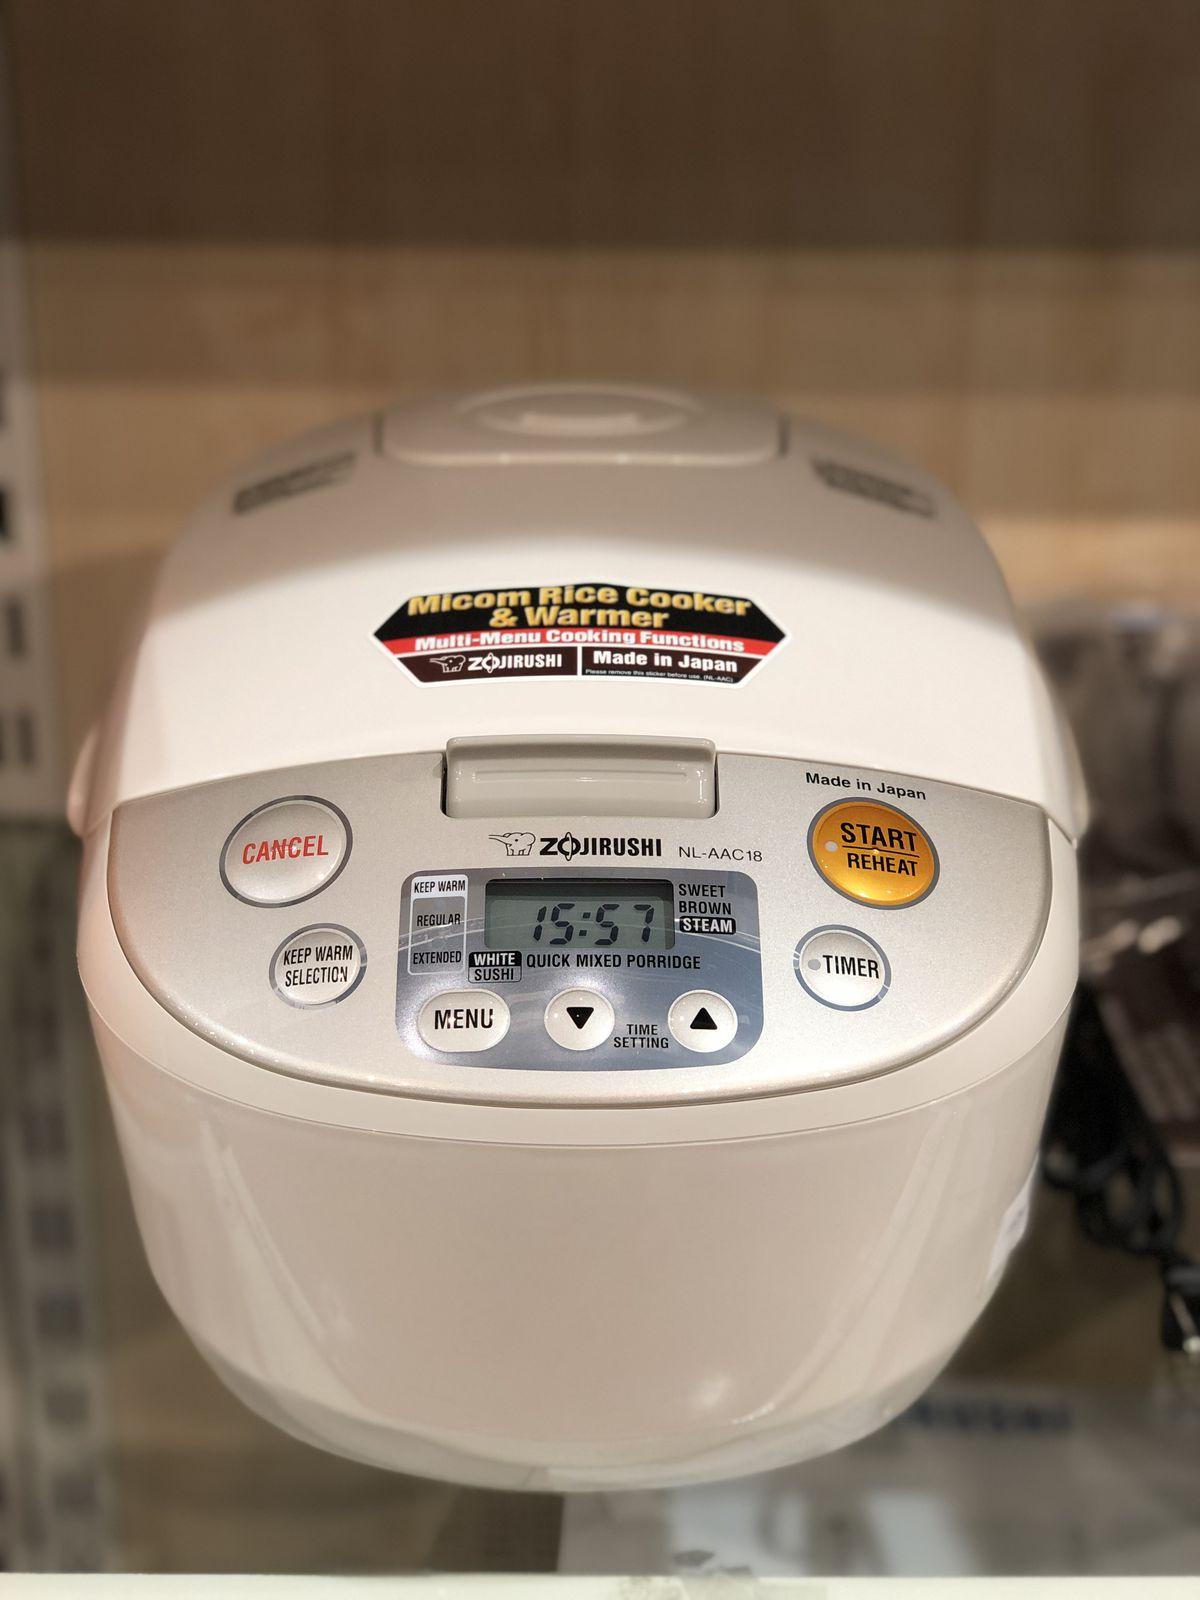 a rice cooker on a shelf